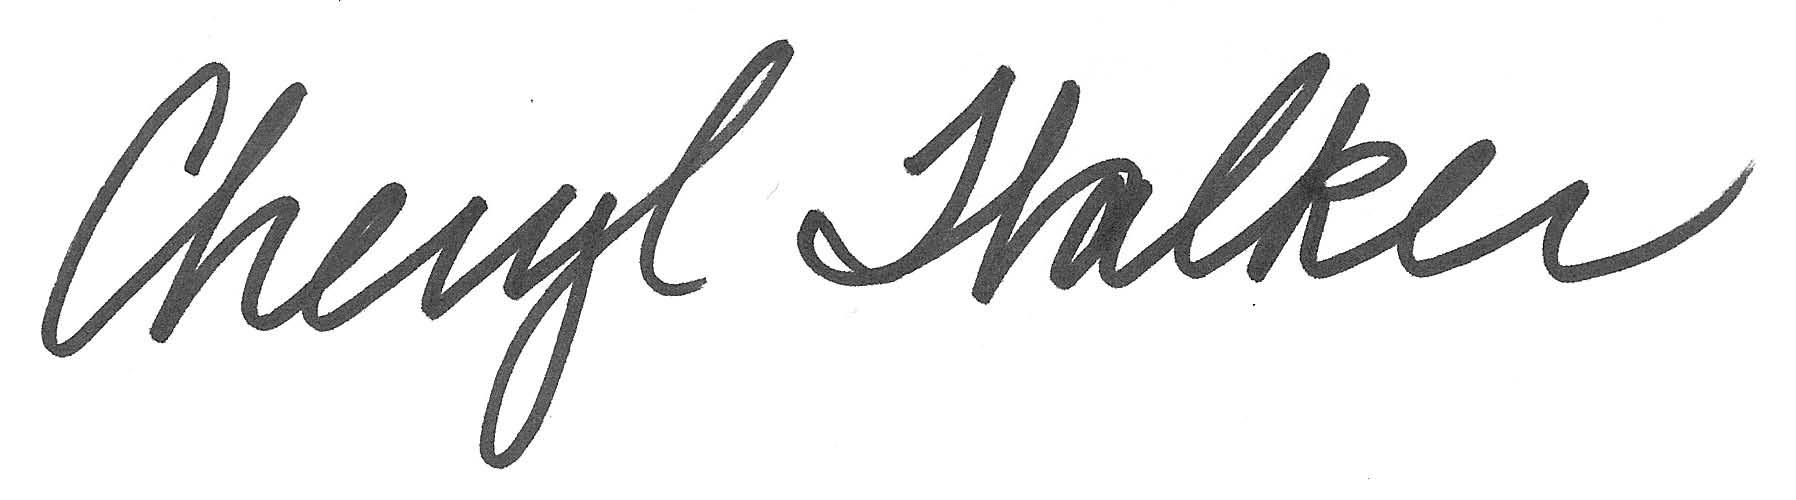 cheryl walker's Signature